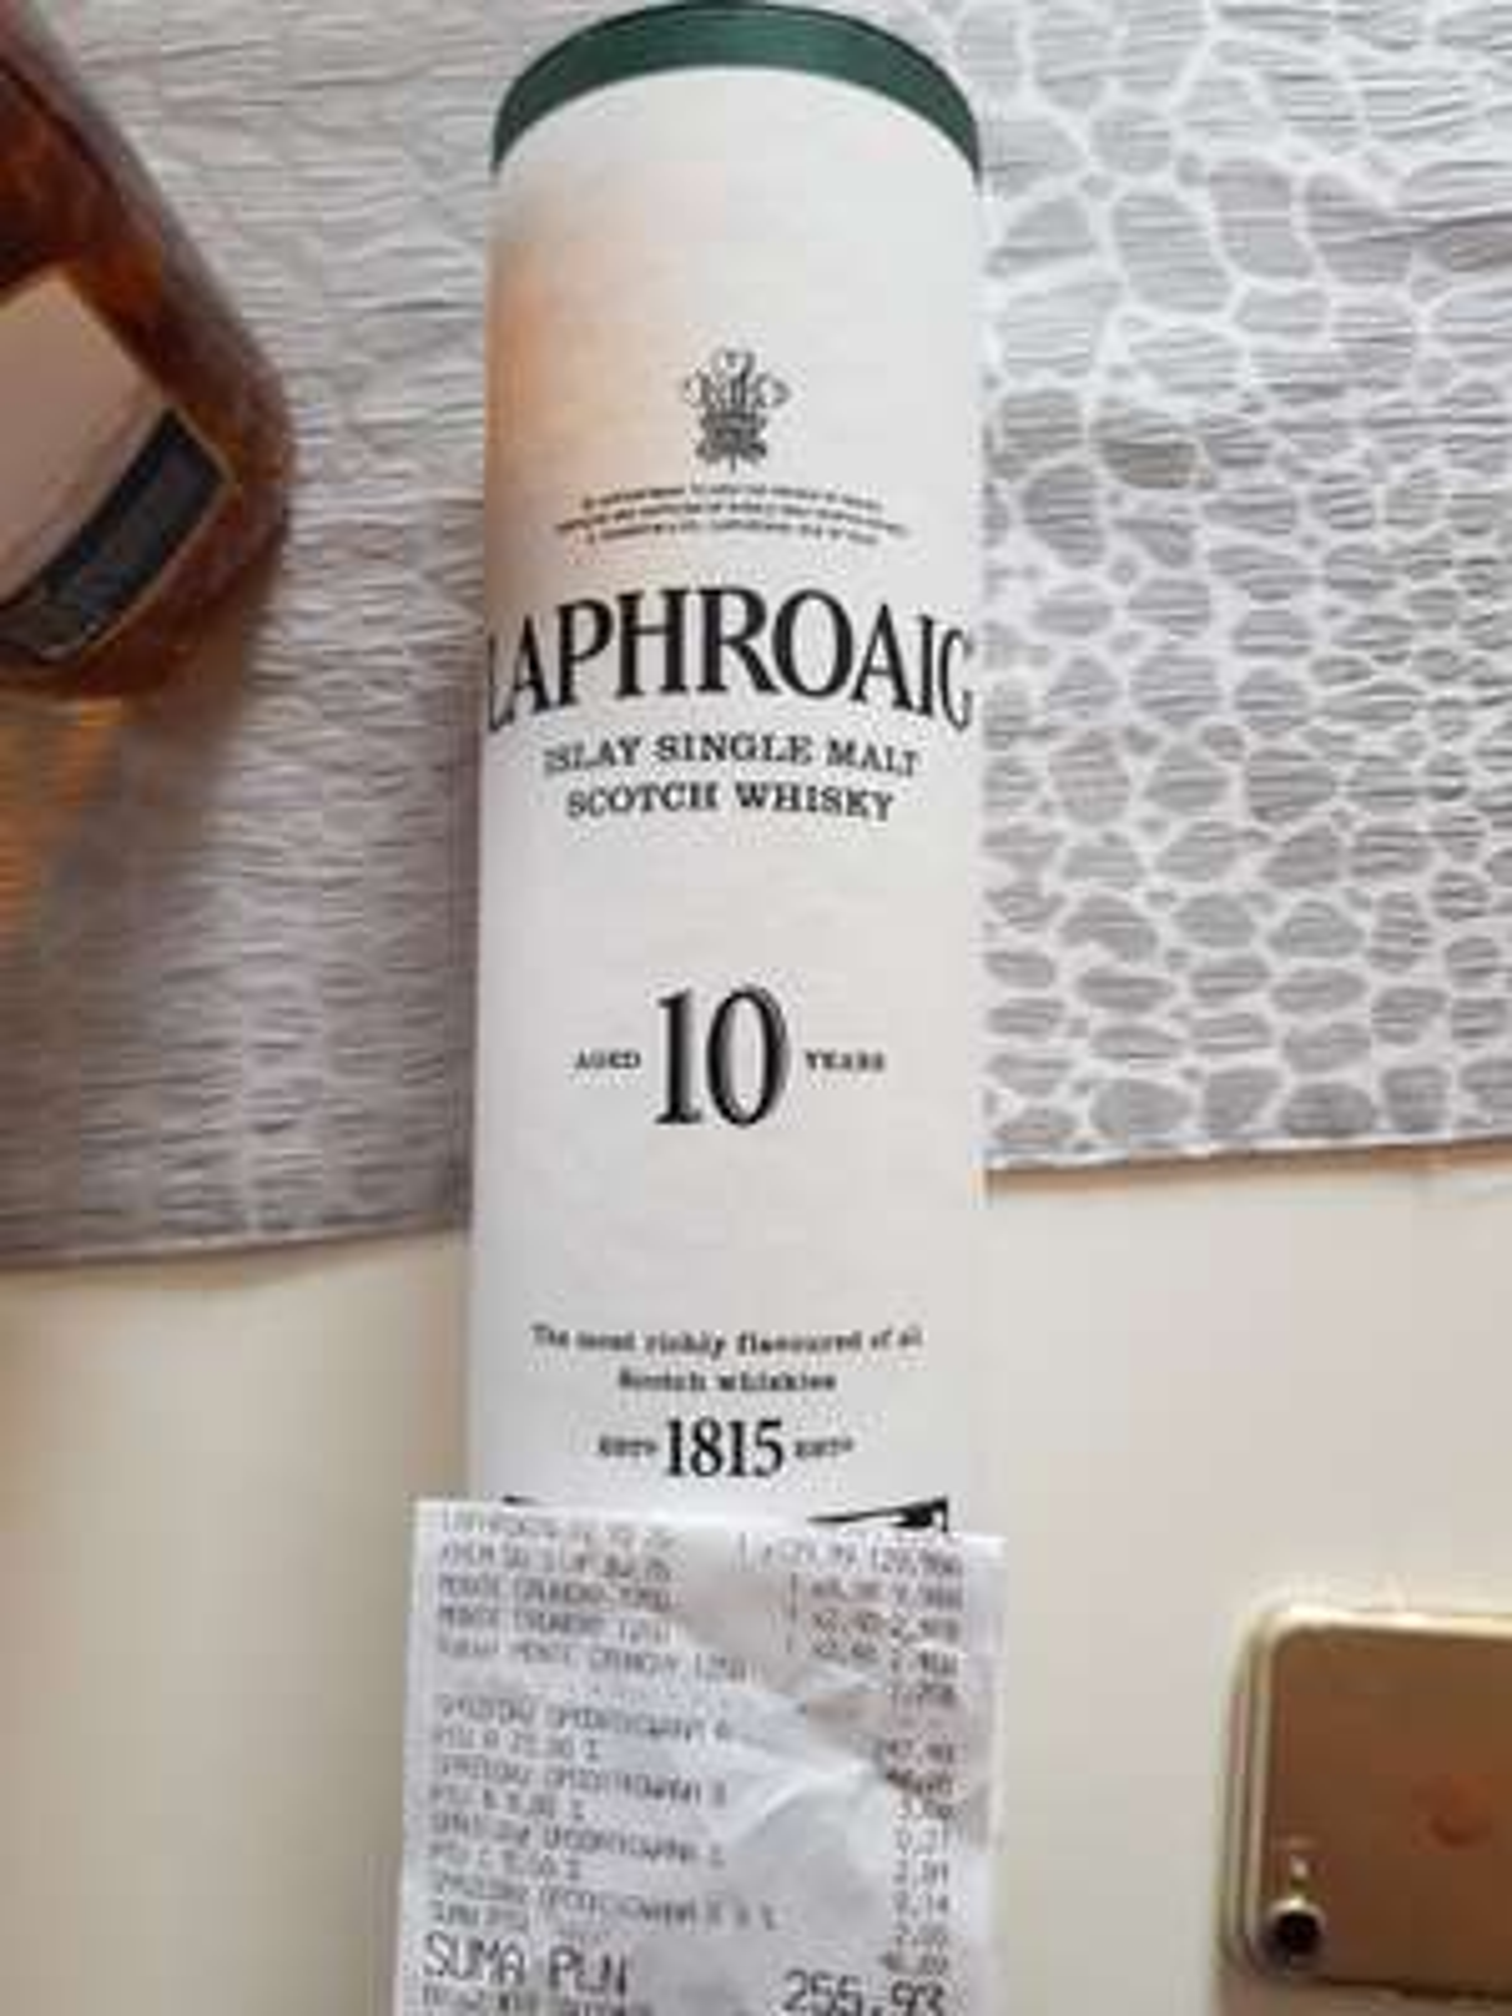 Laphroaig single malt whisky